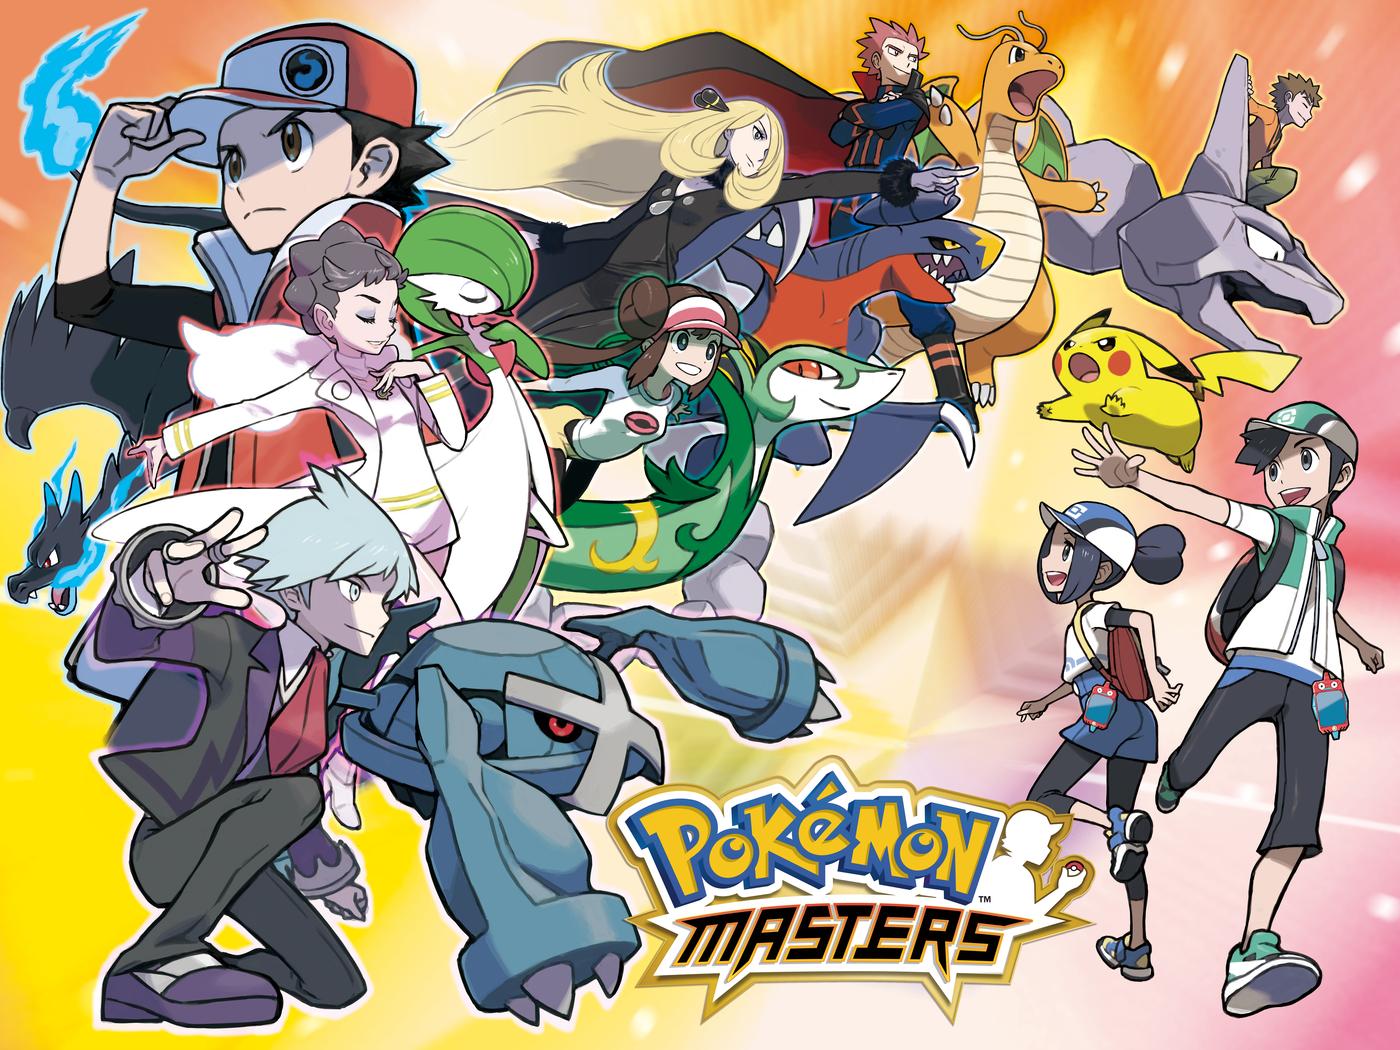 Pokémon Masters is great as a Pokémon game, slow as a mobile game - Polygon